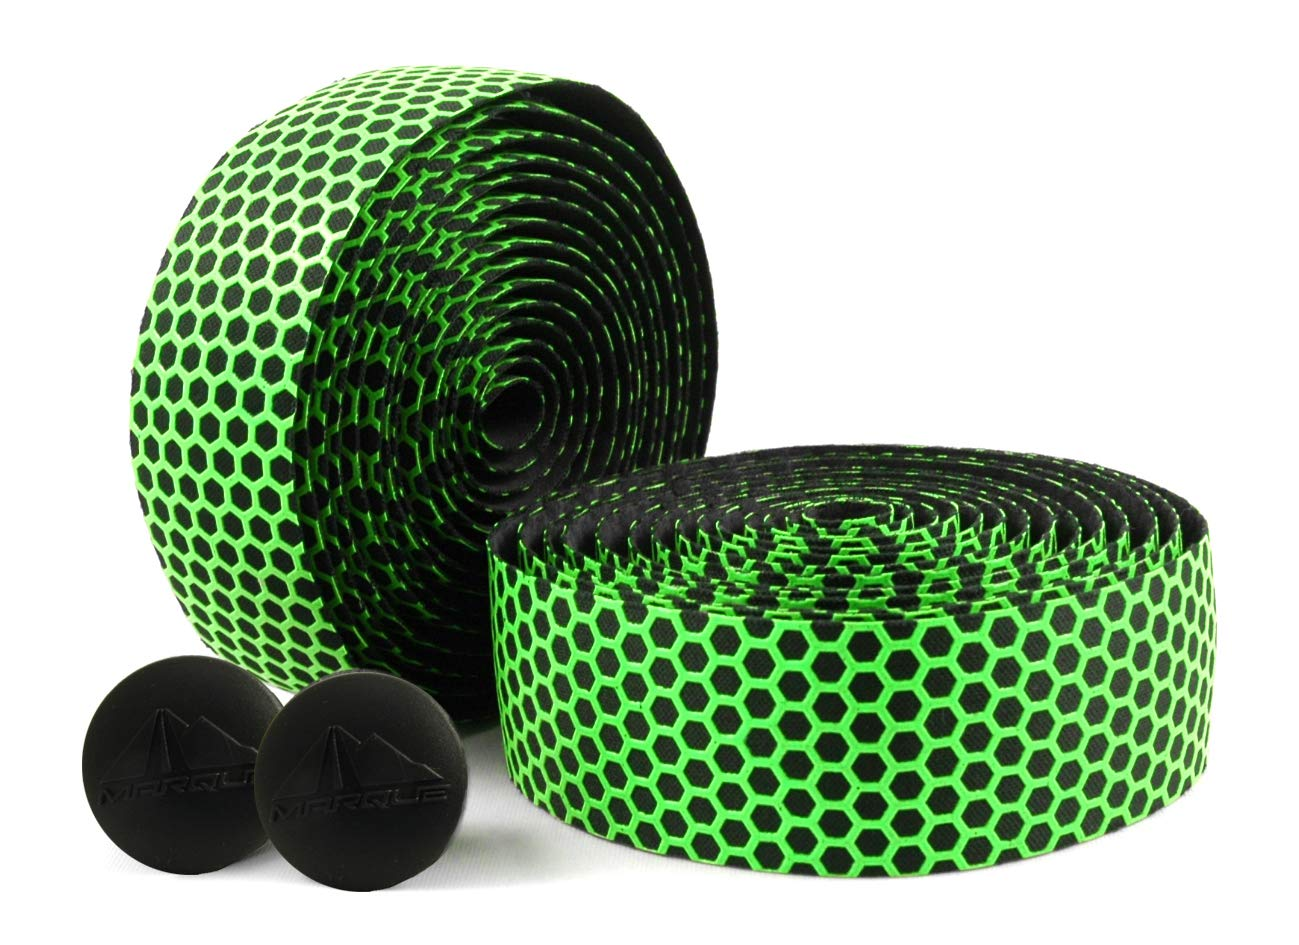 MARQUE Hex Grip Bar Tape - Road Bike Handlebar Tape 2PCS per Set (Green) by MARQUE